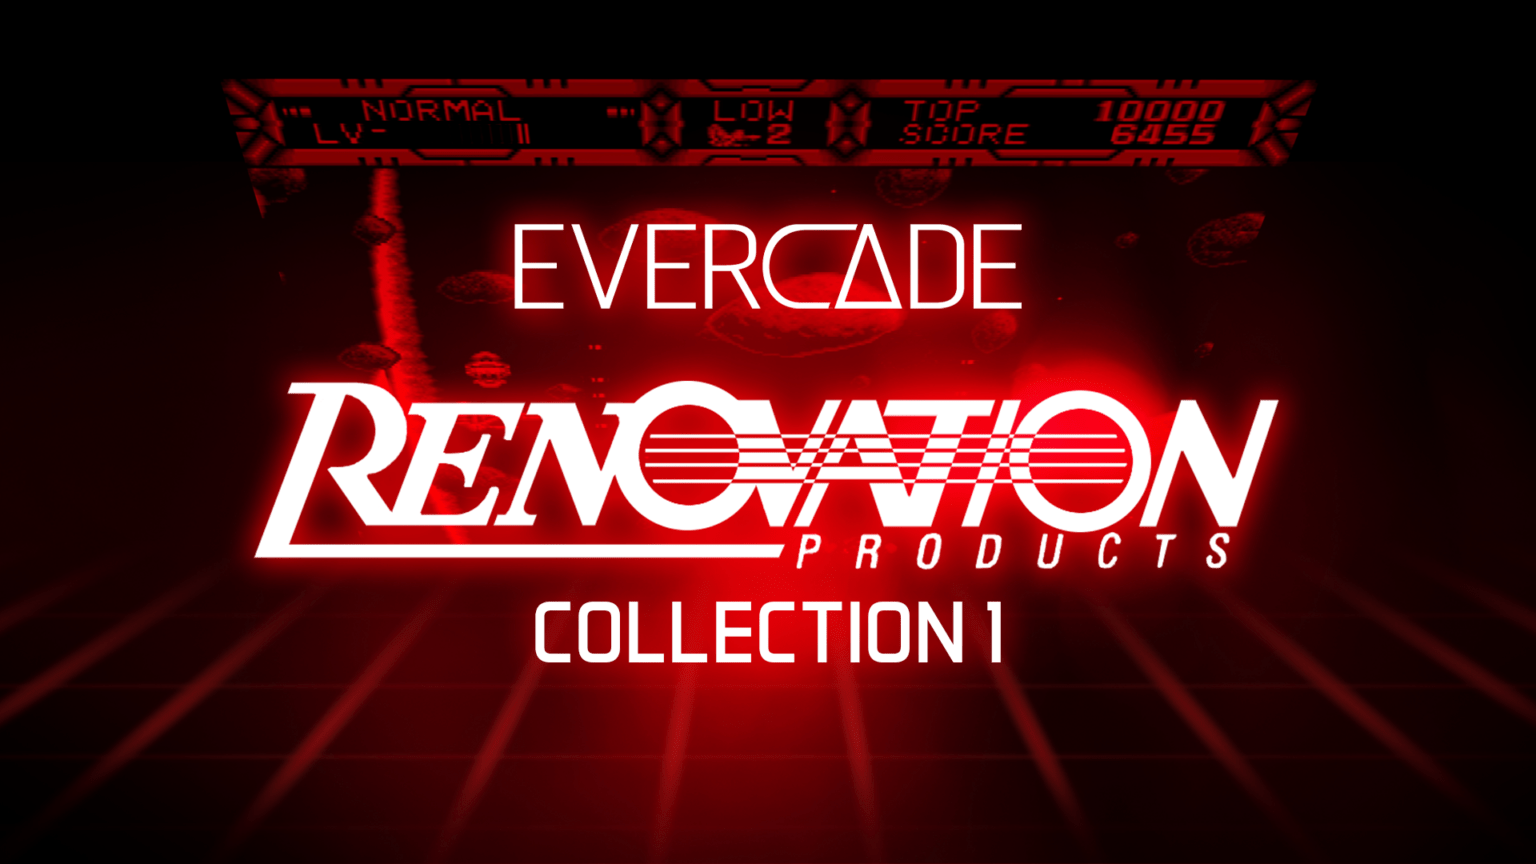 https://evercade.co.uk/wp-content/uploads/2021/07/Evercade_Renovation_Annou_1920x1080_-1-1536x864.png